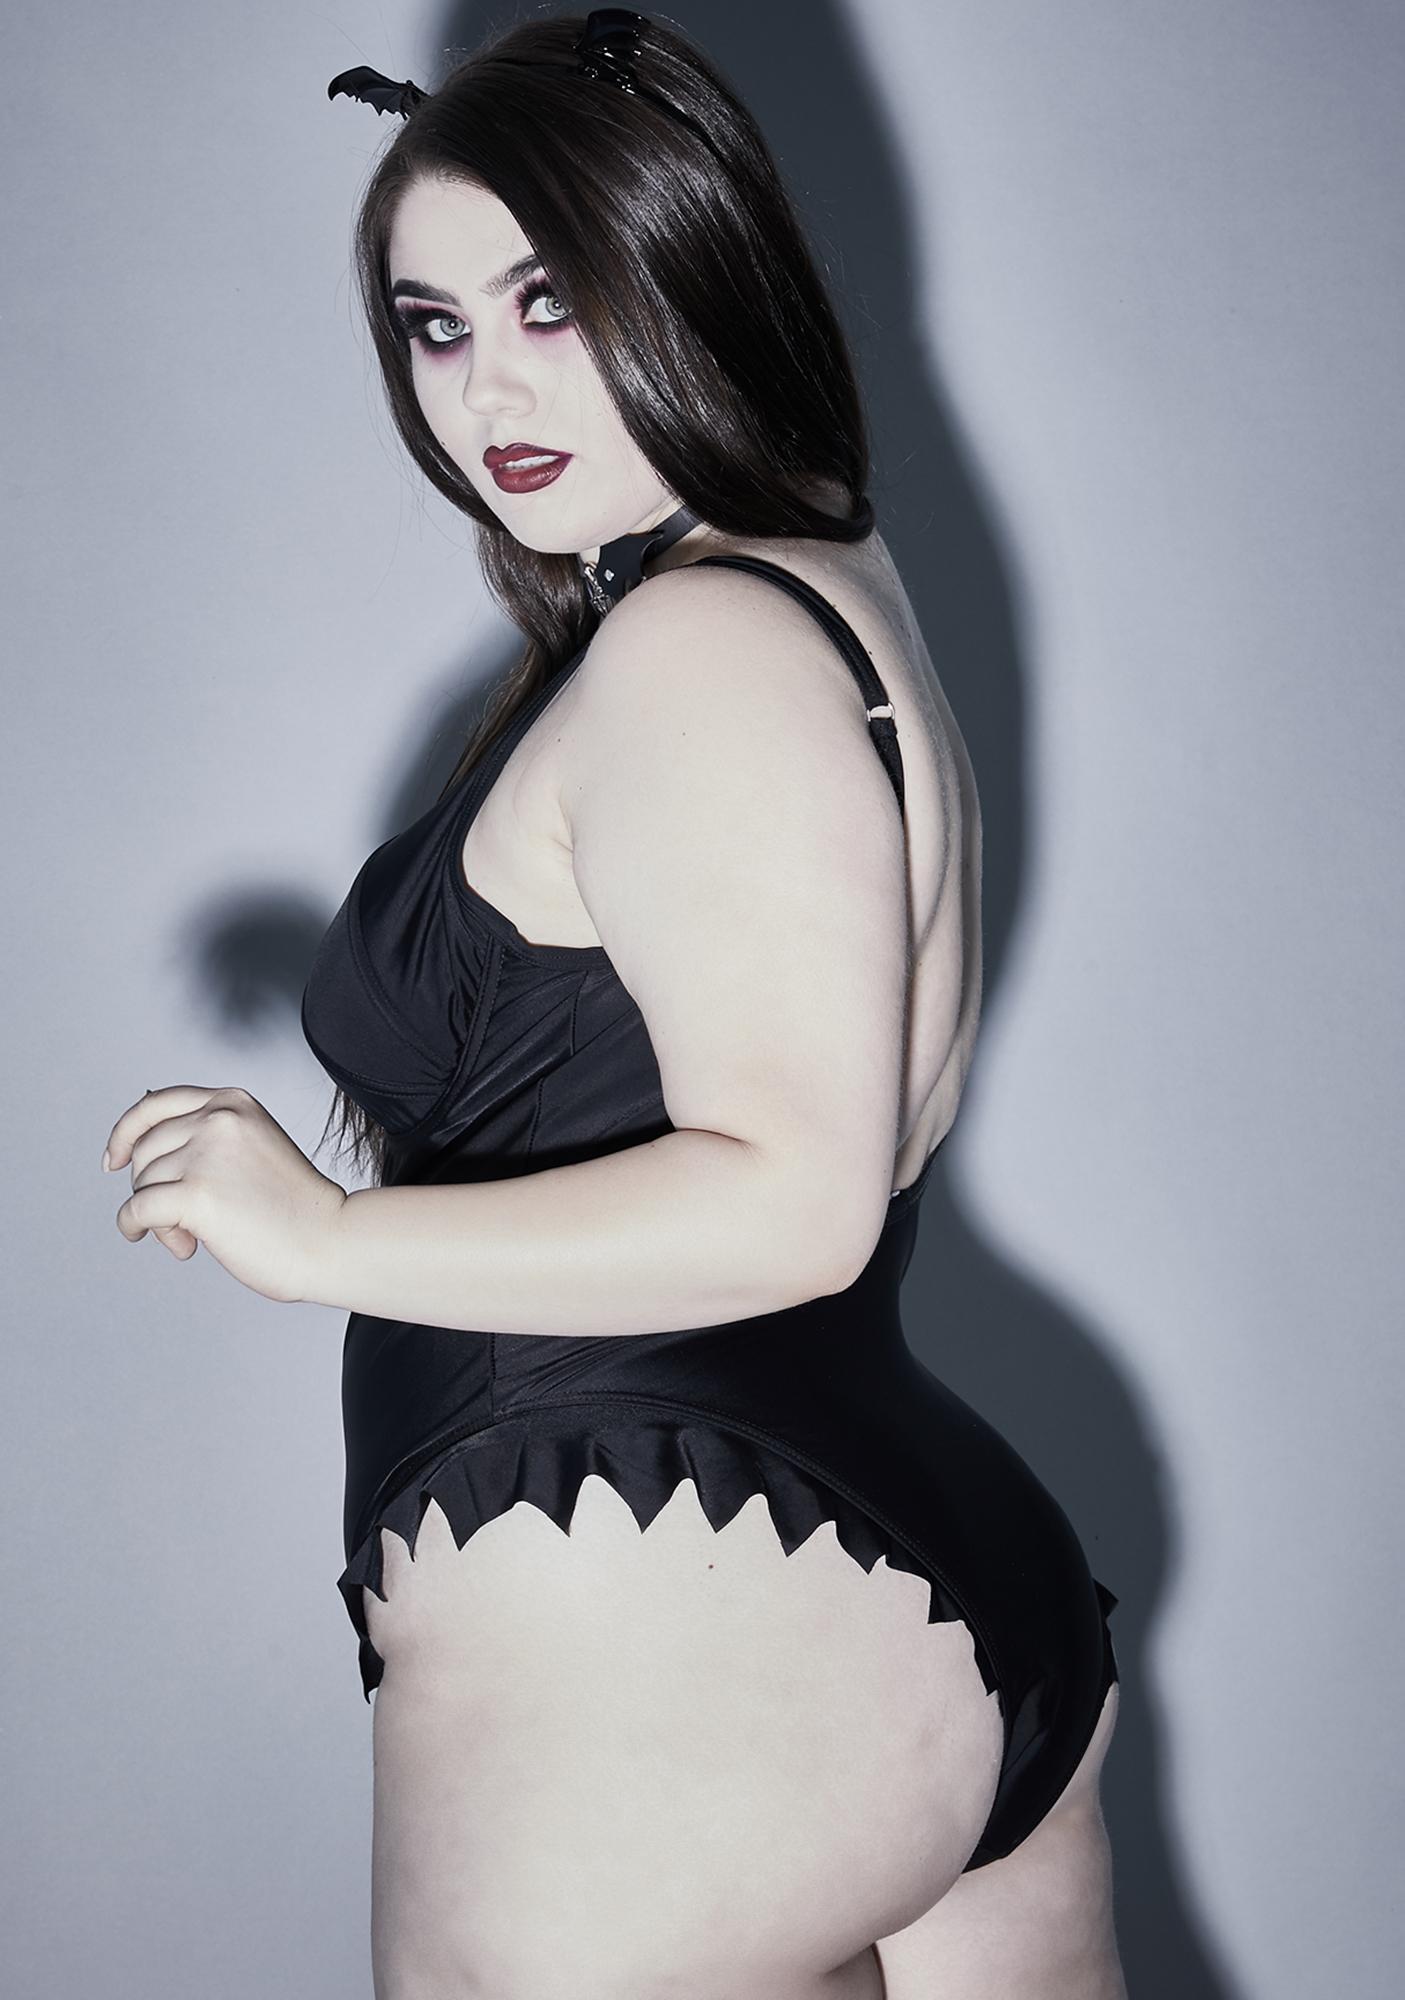 Widow C'mon Call Me Batty One Piece Swimsuit